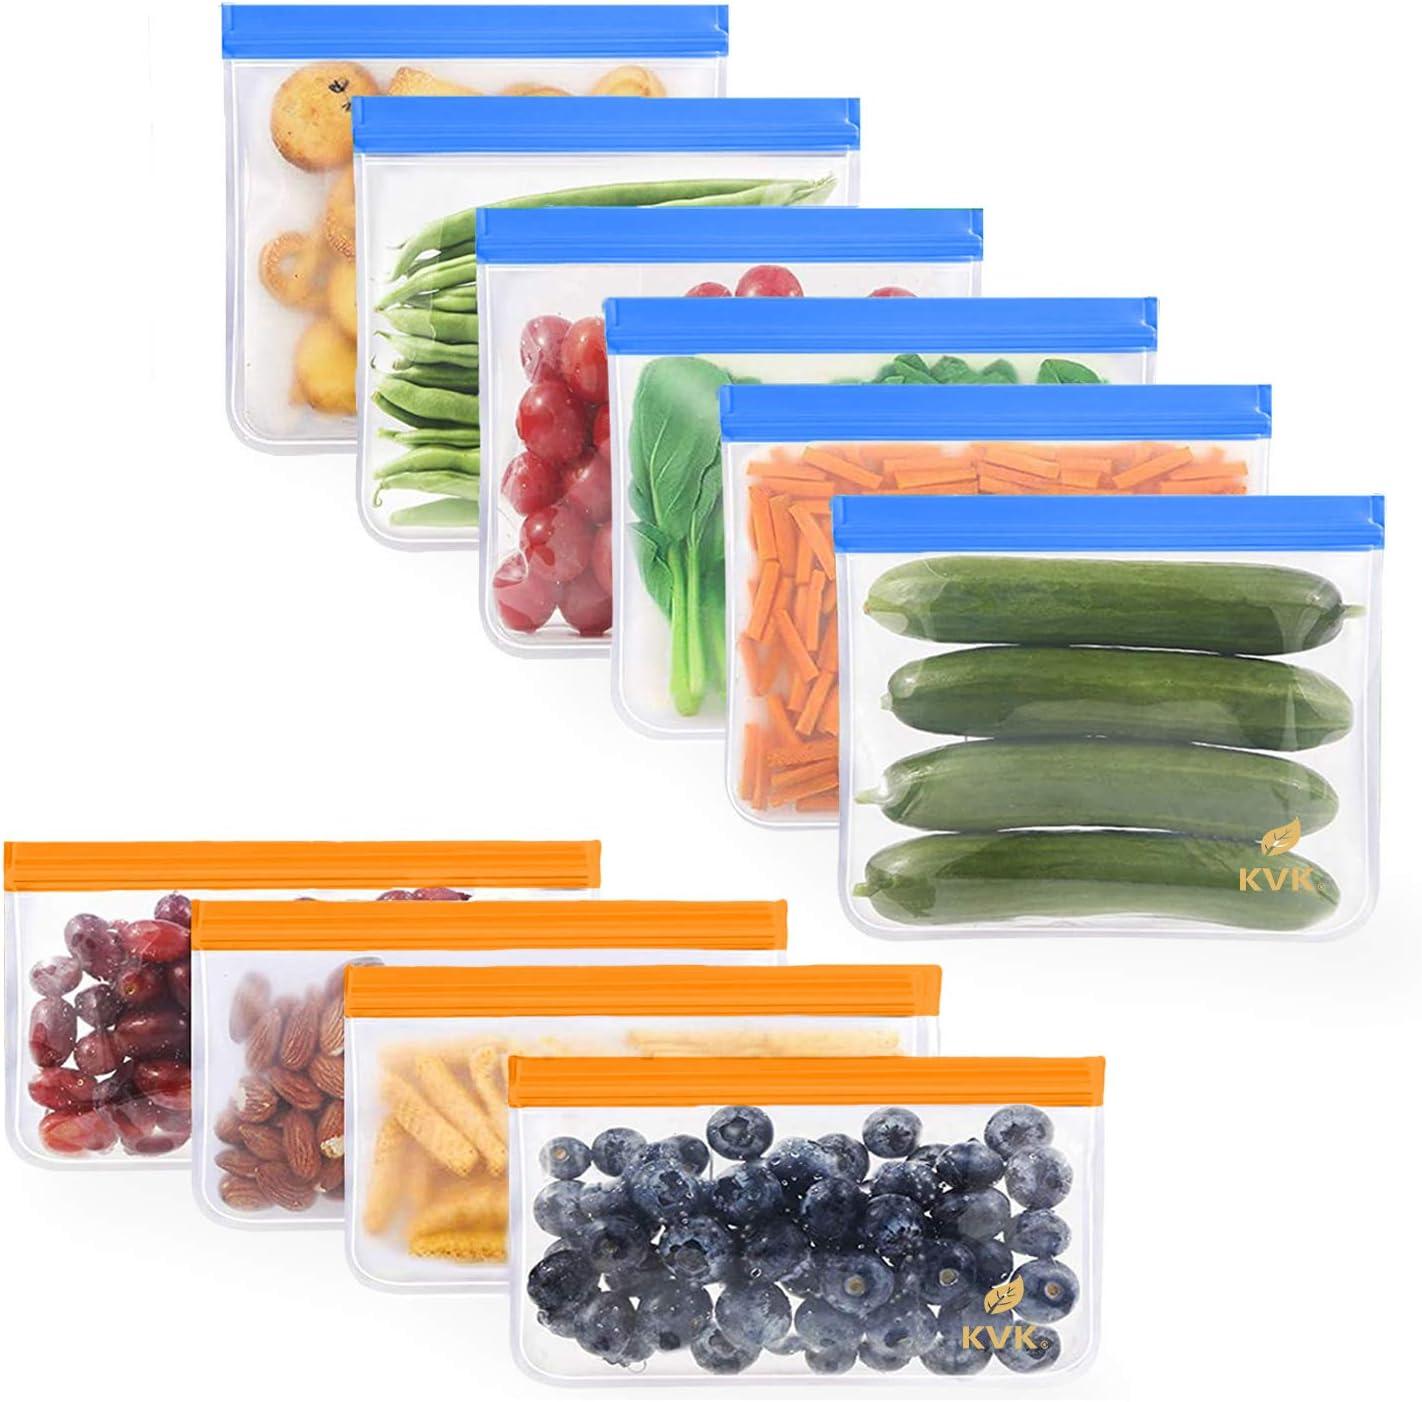 10 Pack Reusable Food Storage Bags, 6 Reusable Sandwich Bags + 4 Reusable Snack Bags, Food-Grade PEVA Reusable Ziplock Bags, Washable Leakproof Plastic - Free Lunch Bags